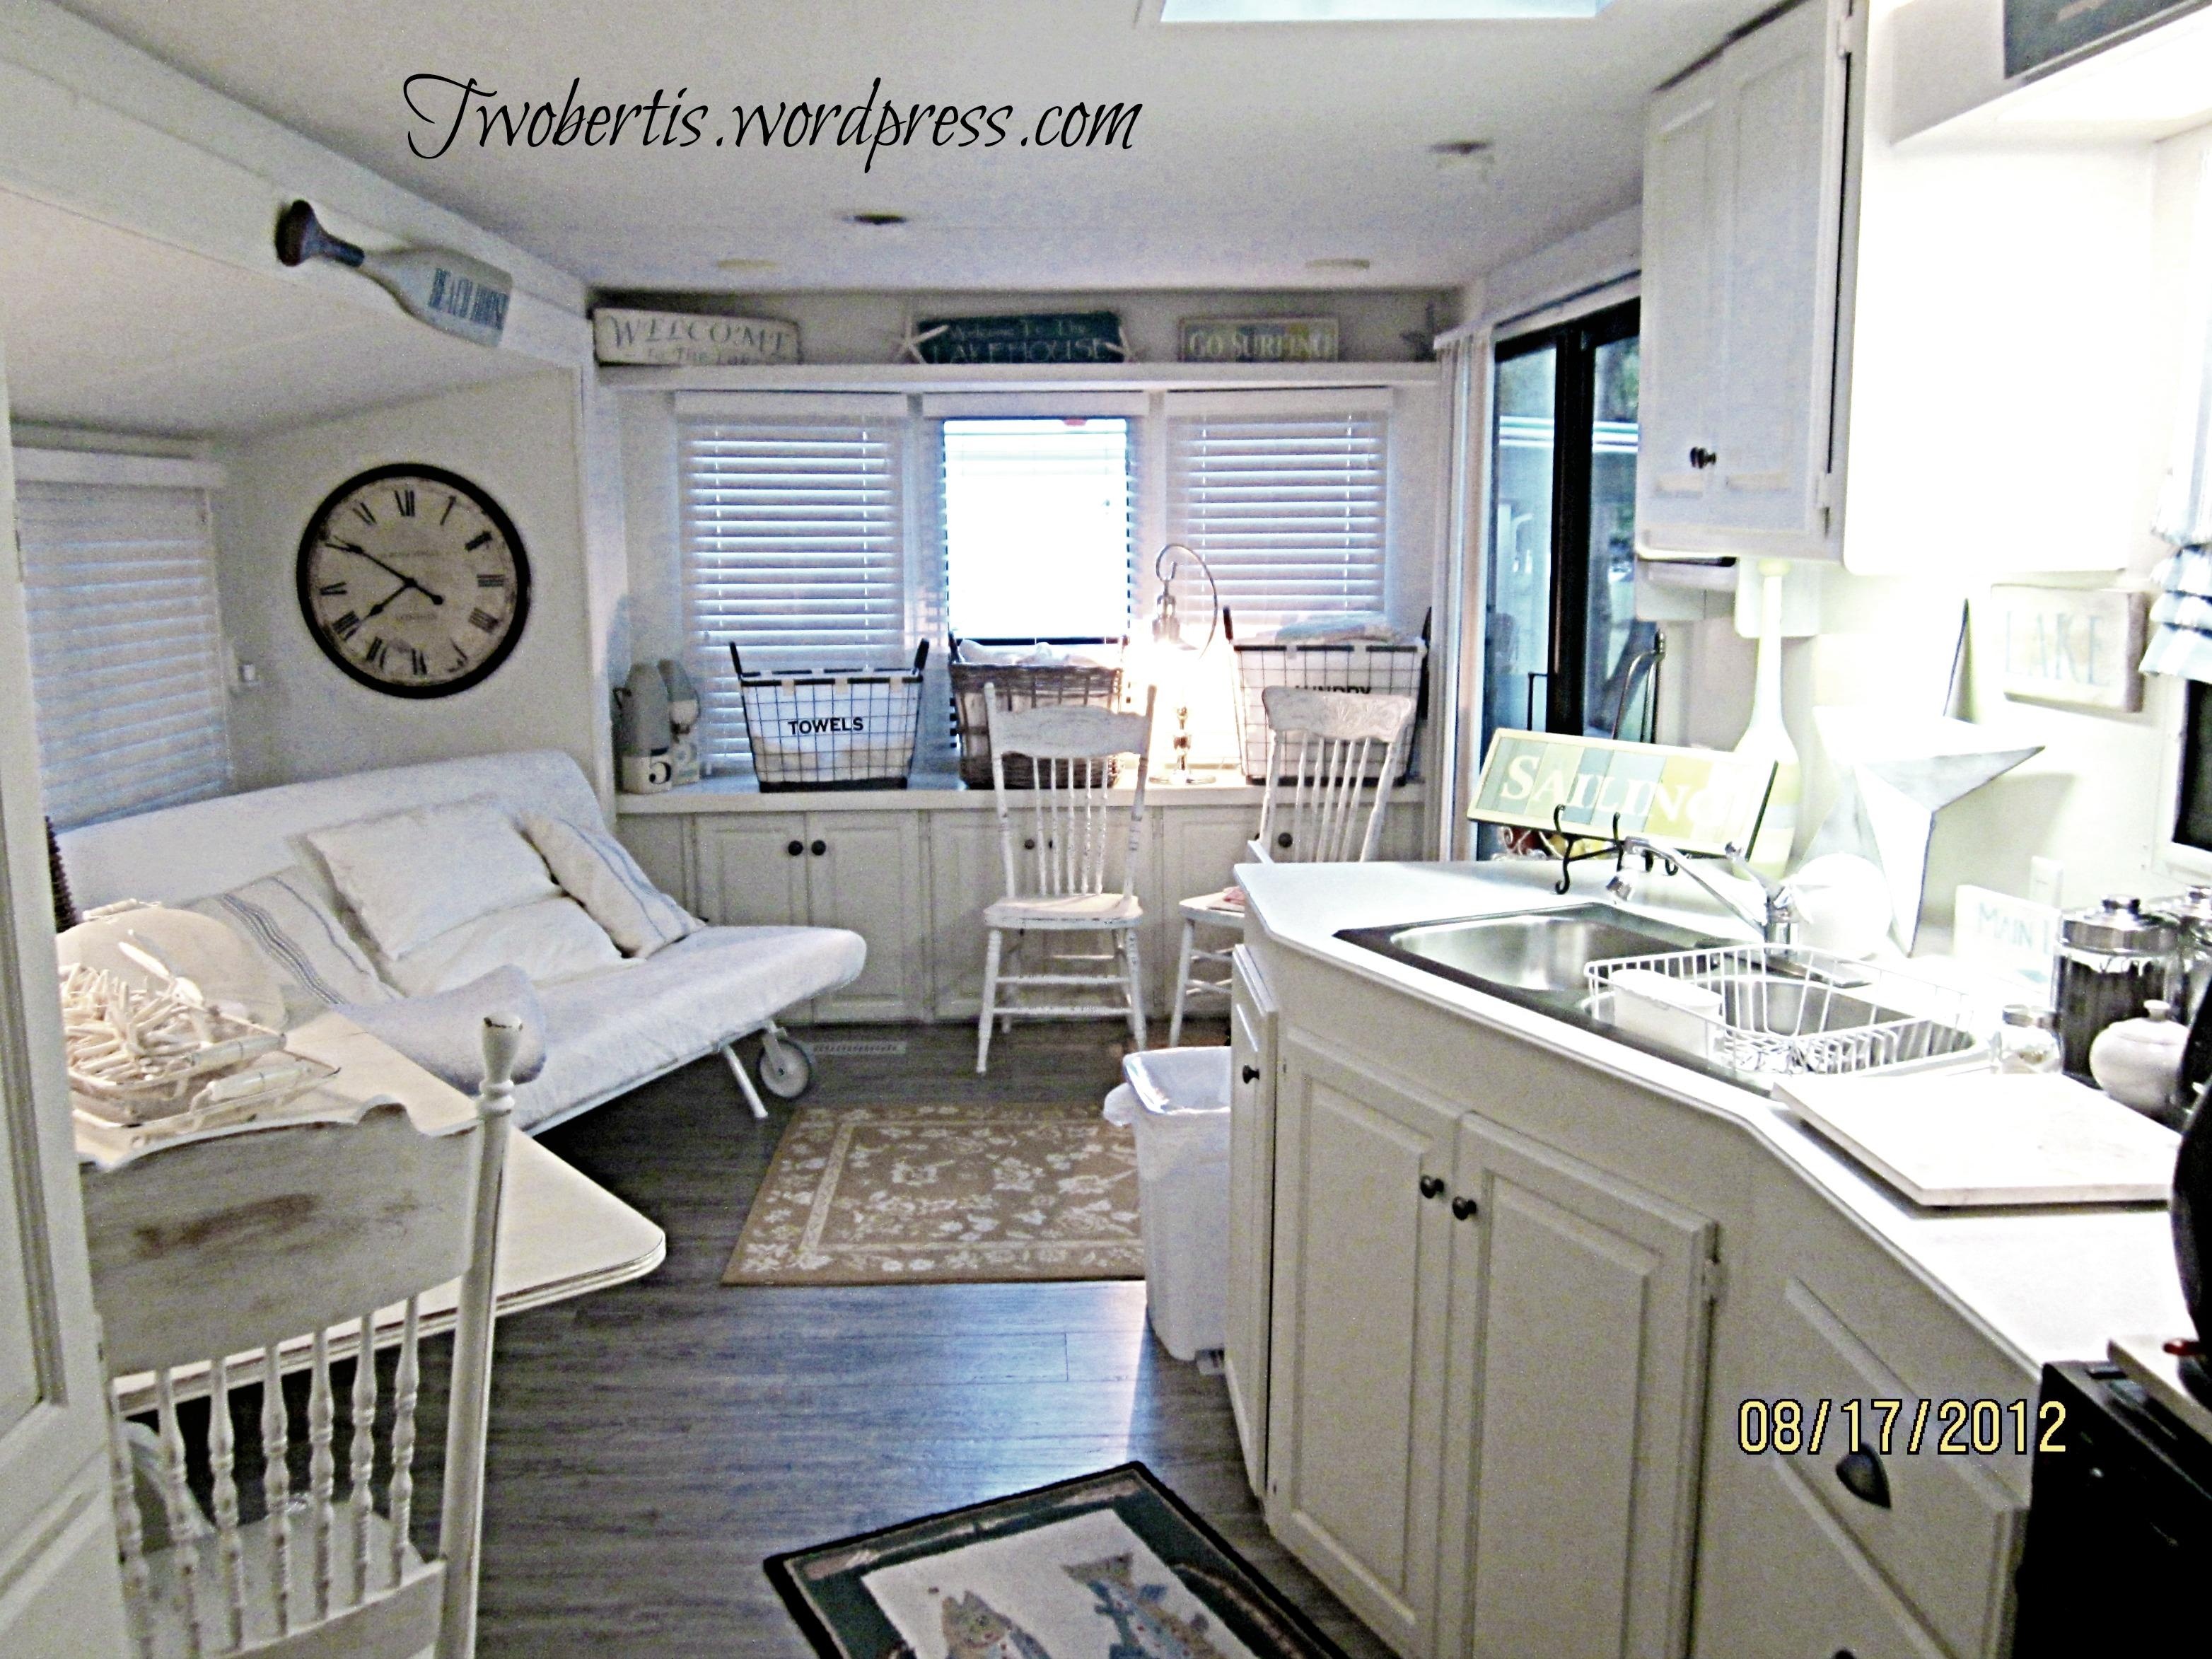 Unique Double Kitchen Sink  Stainless Steel Color  Lippert Components Inc